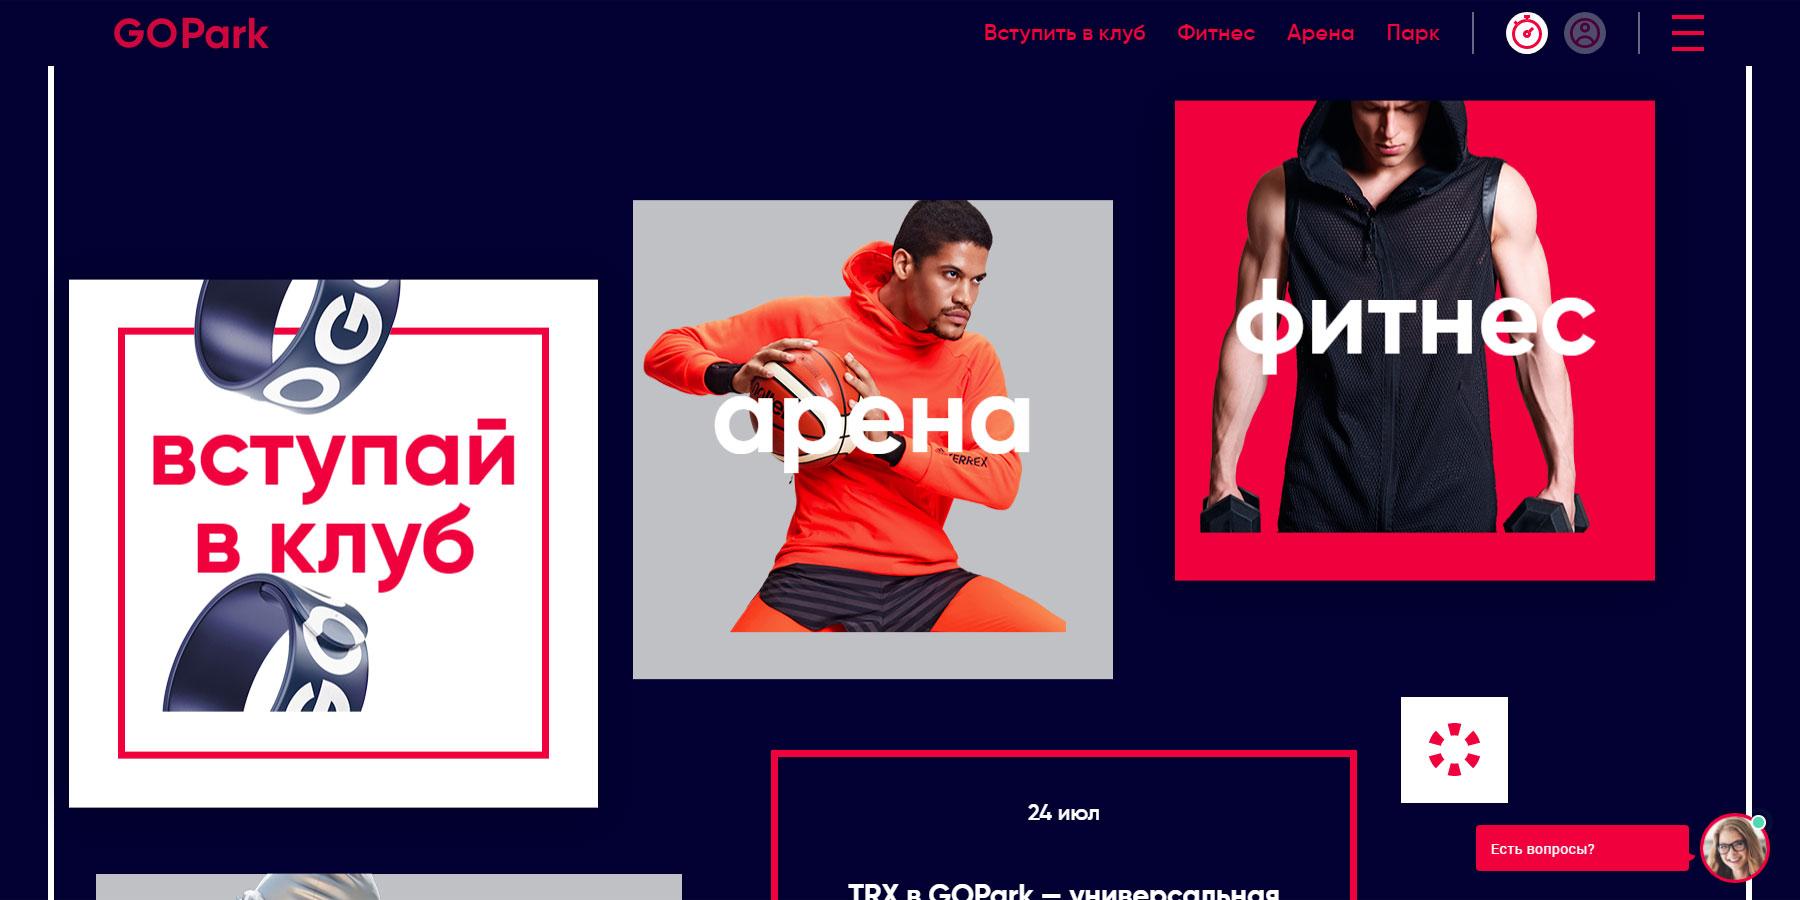 GOPark — sport center. - Website of the Day